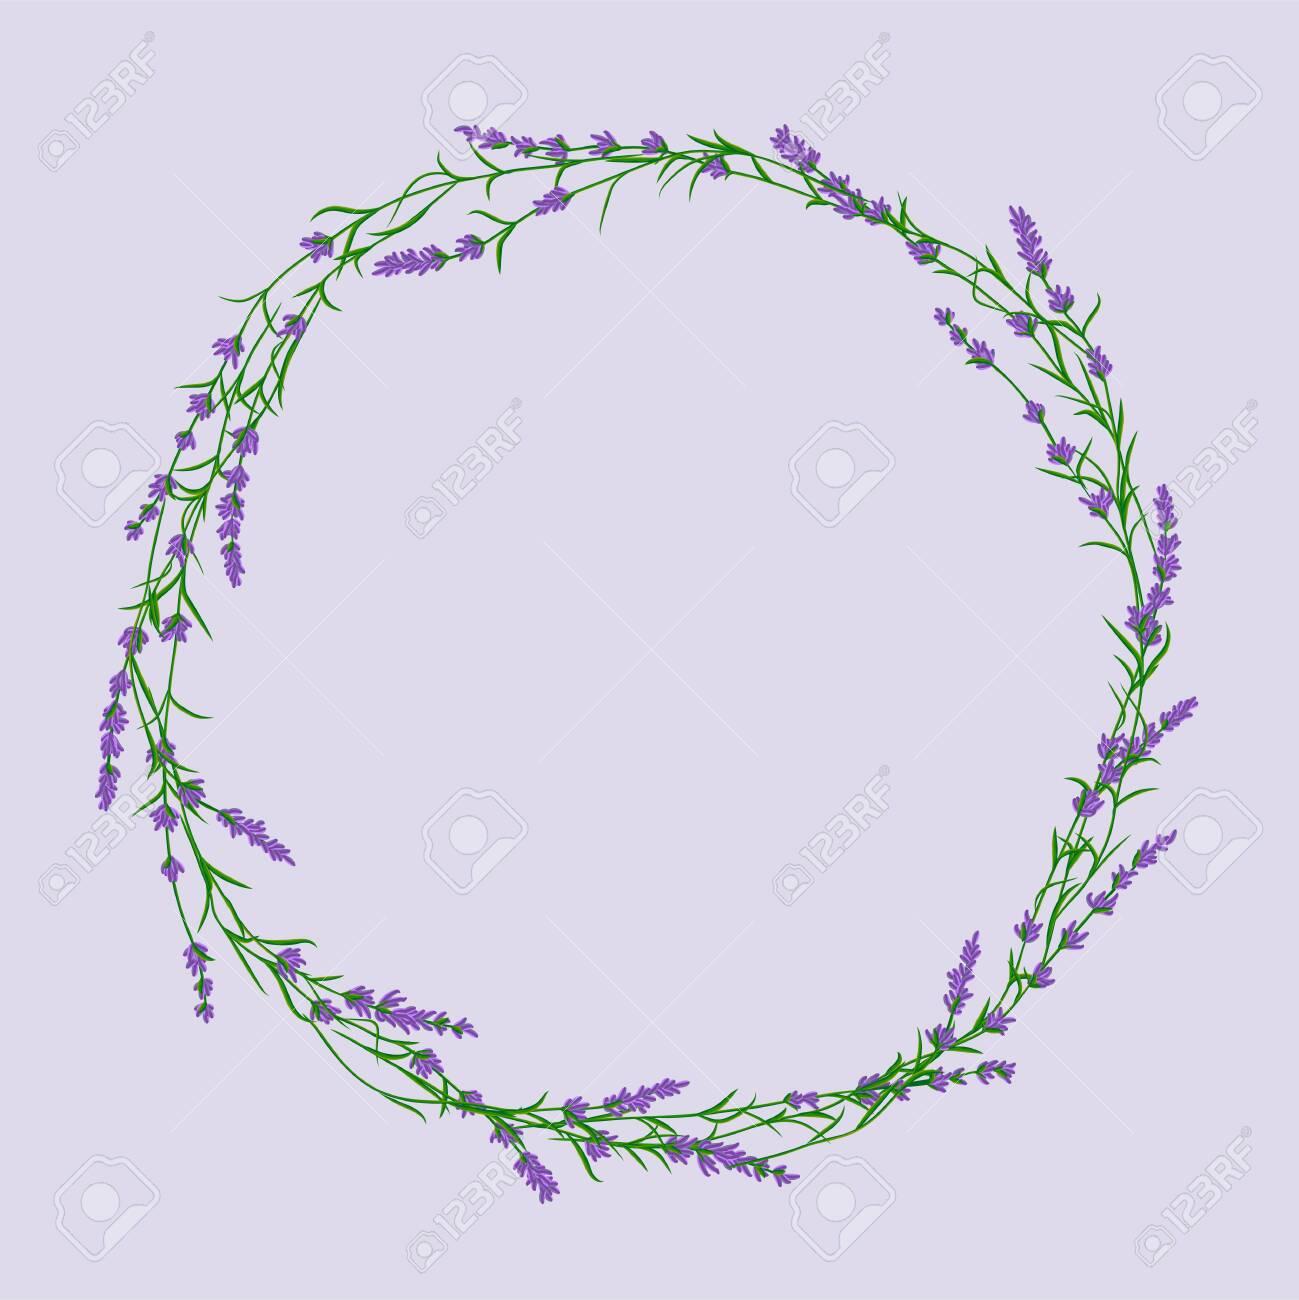 Lavender flower wreath vector ittustration. Postcard layout mockup - 152069629